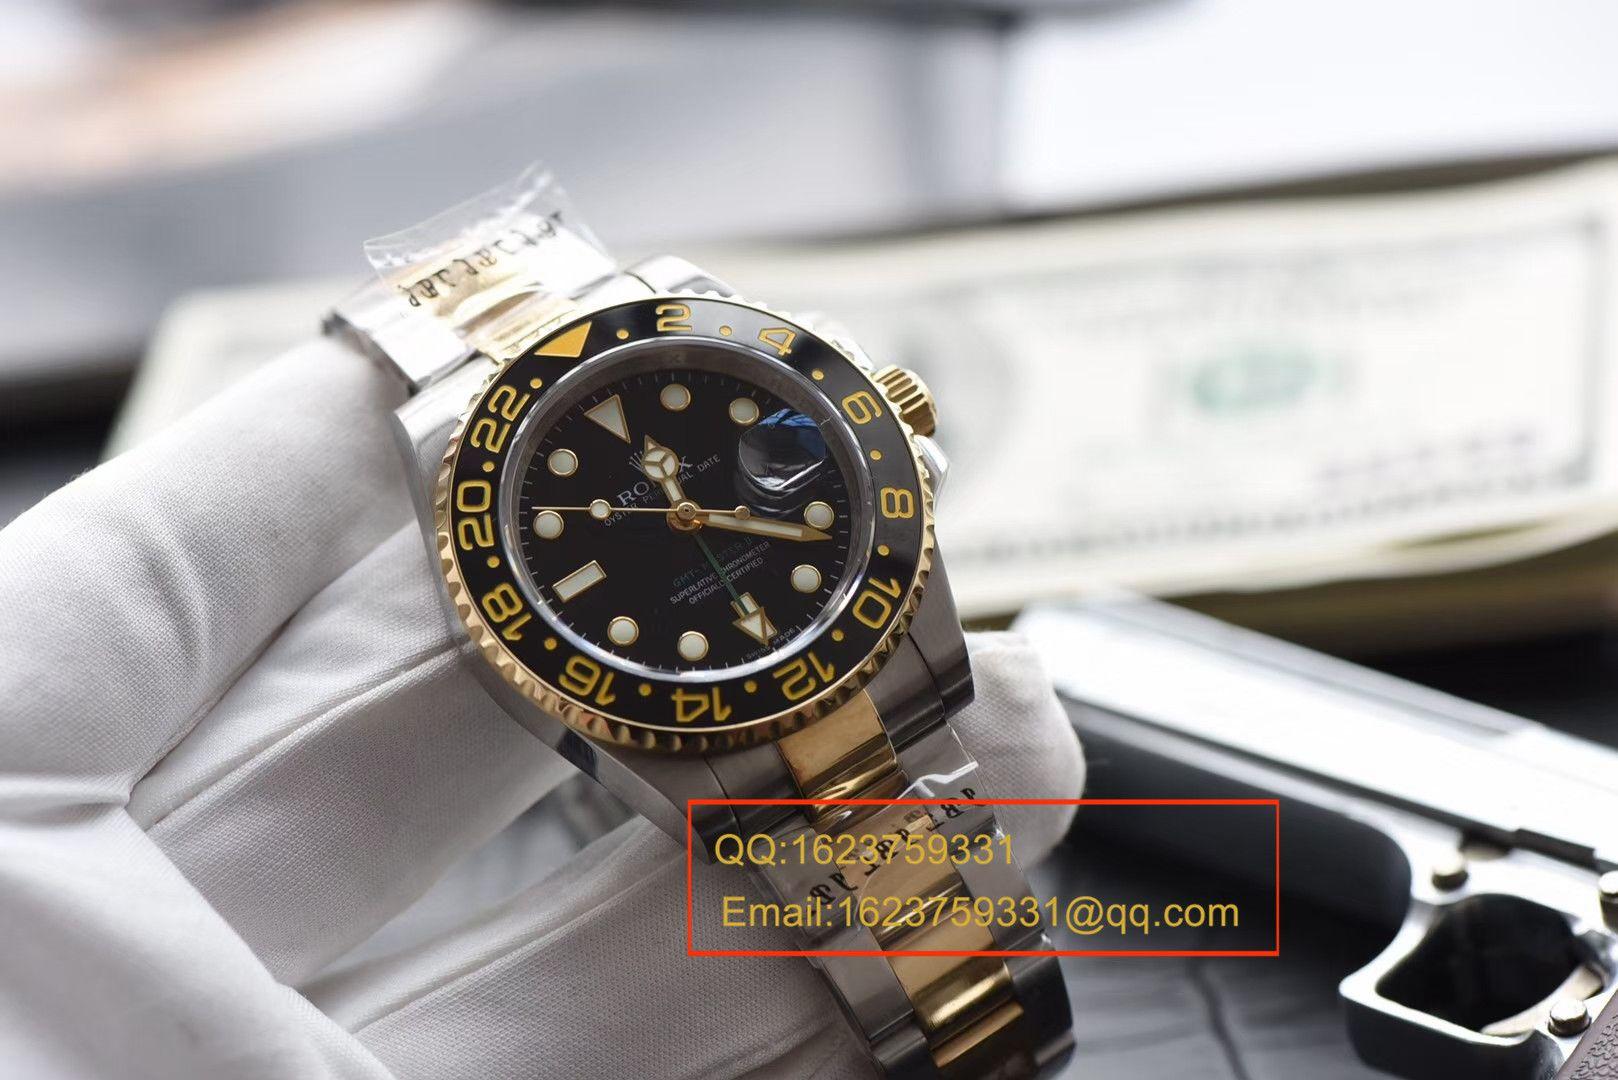 【N厂V7版本一比一精仿手表】劳力士格林尼治型II系列116713-LN-78203腕表【可选择包金款】